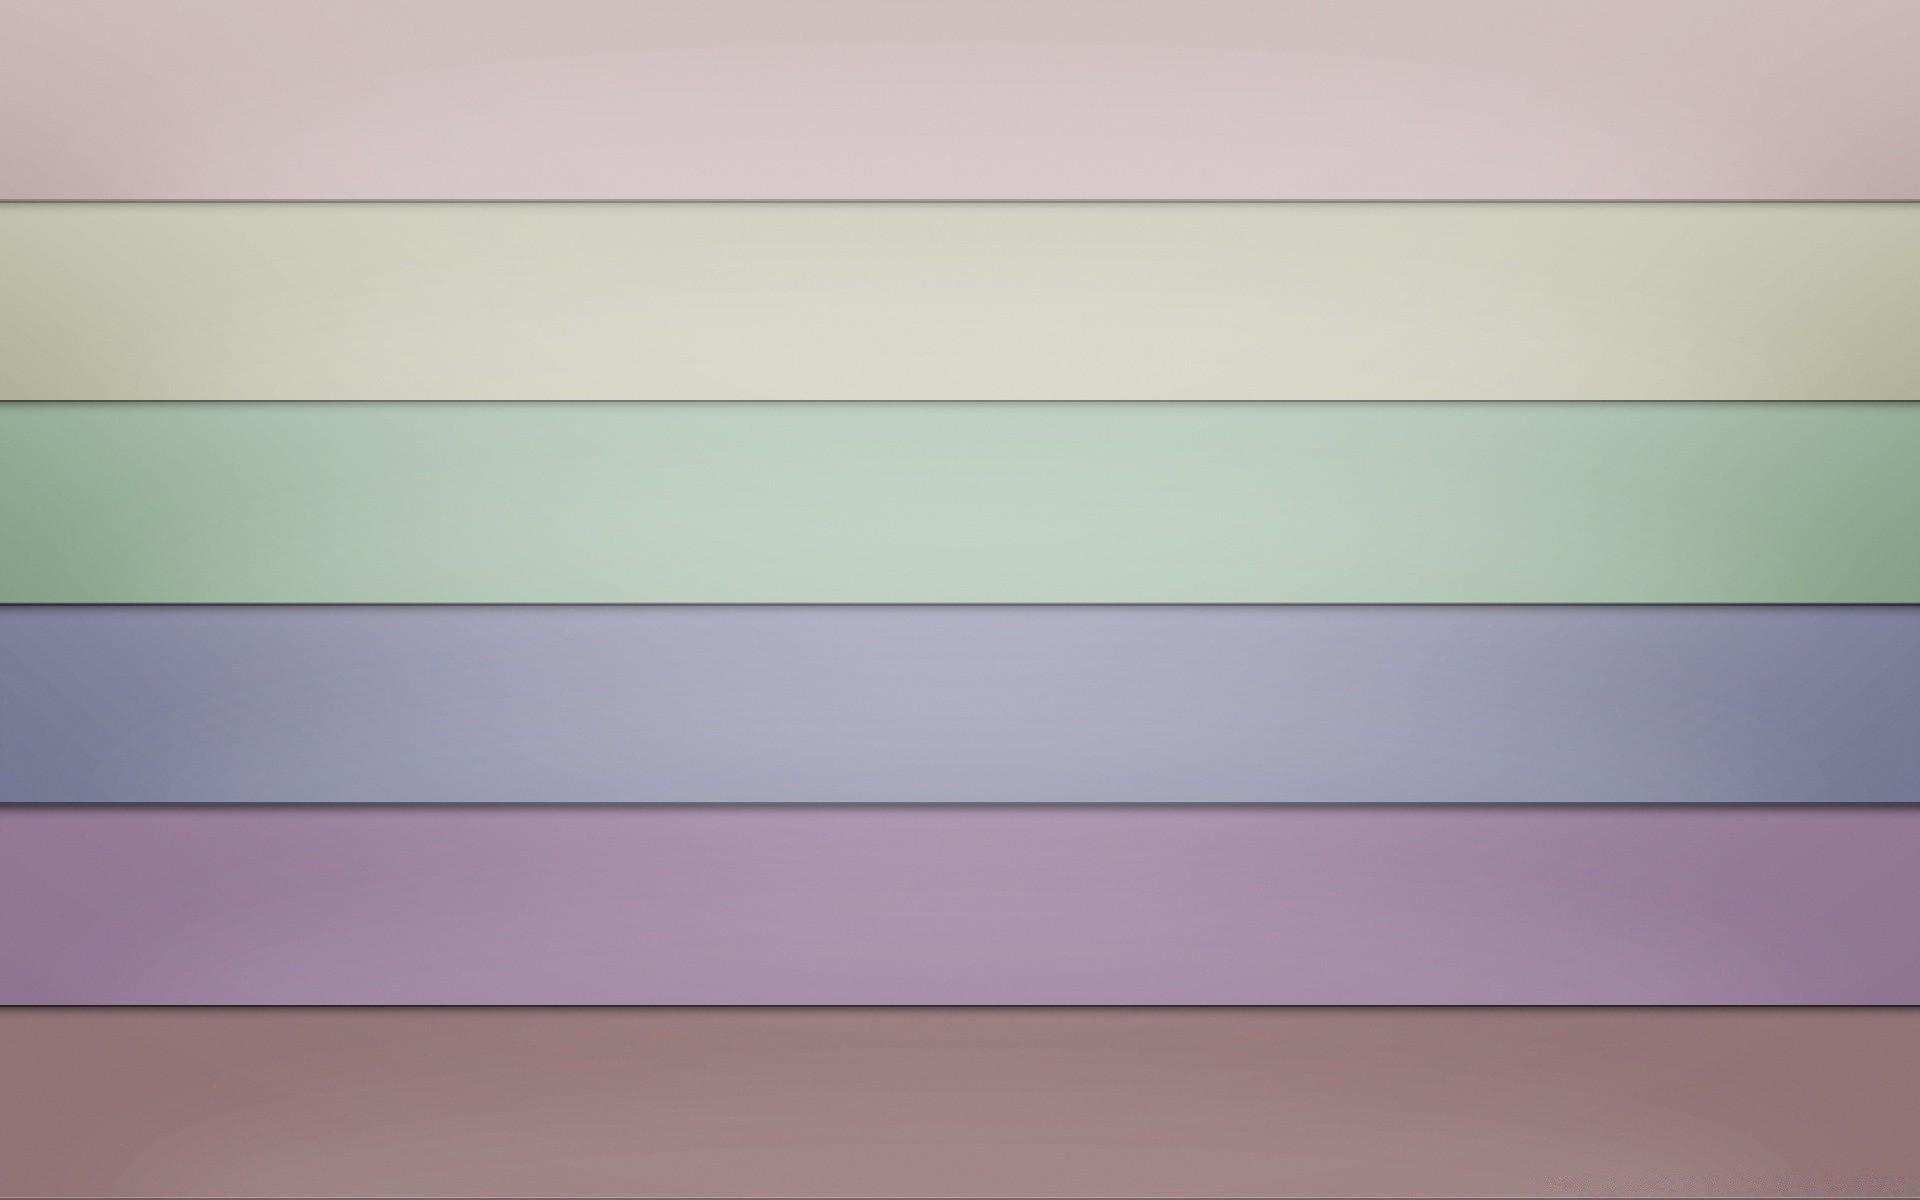 Pastel Colors Desktop Wallpapers For Free